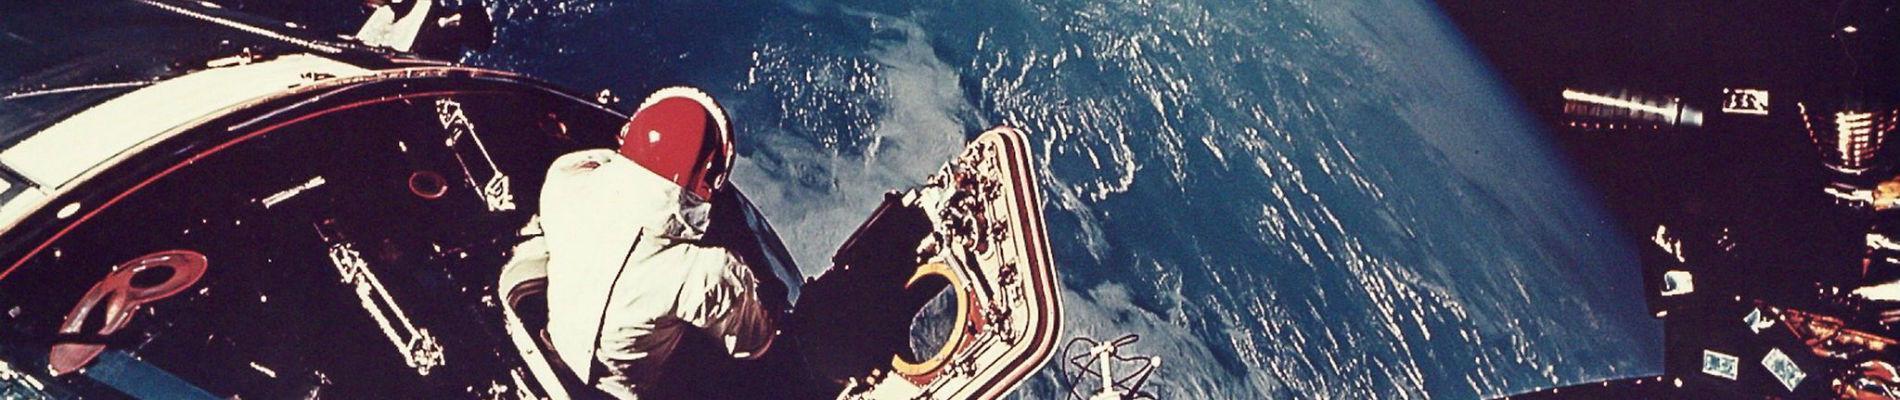 The Apollo Space Program